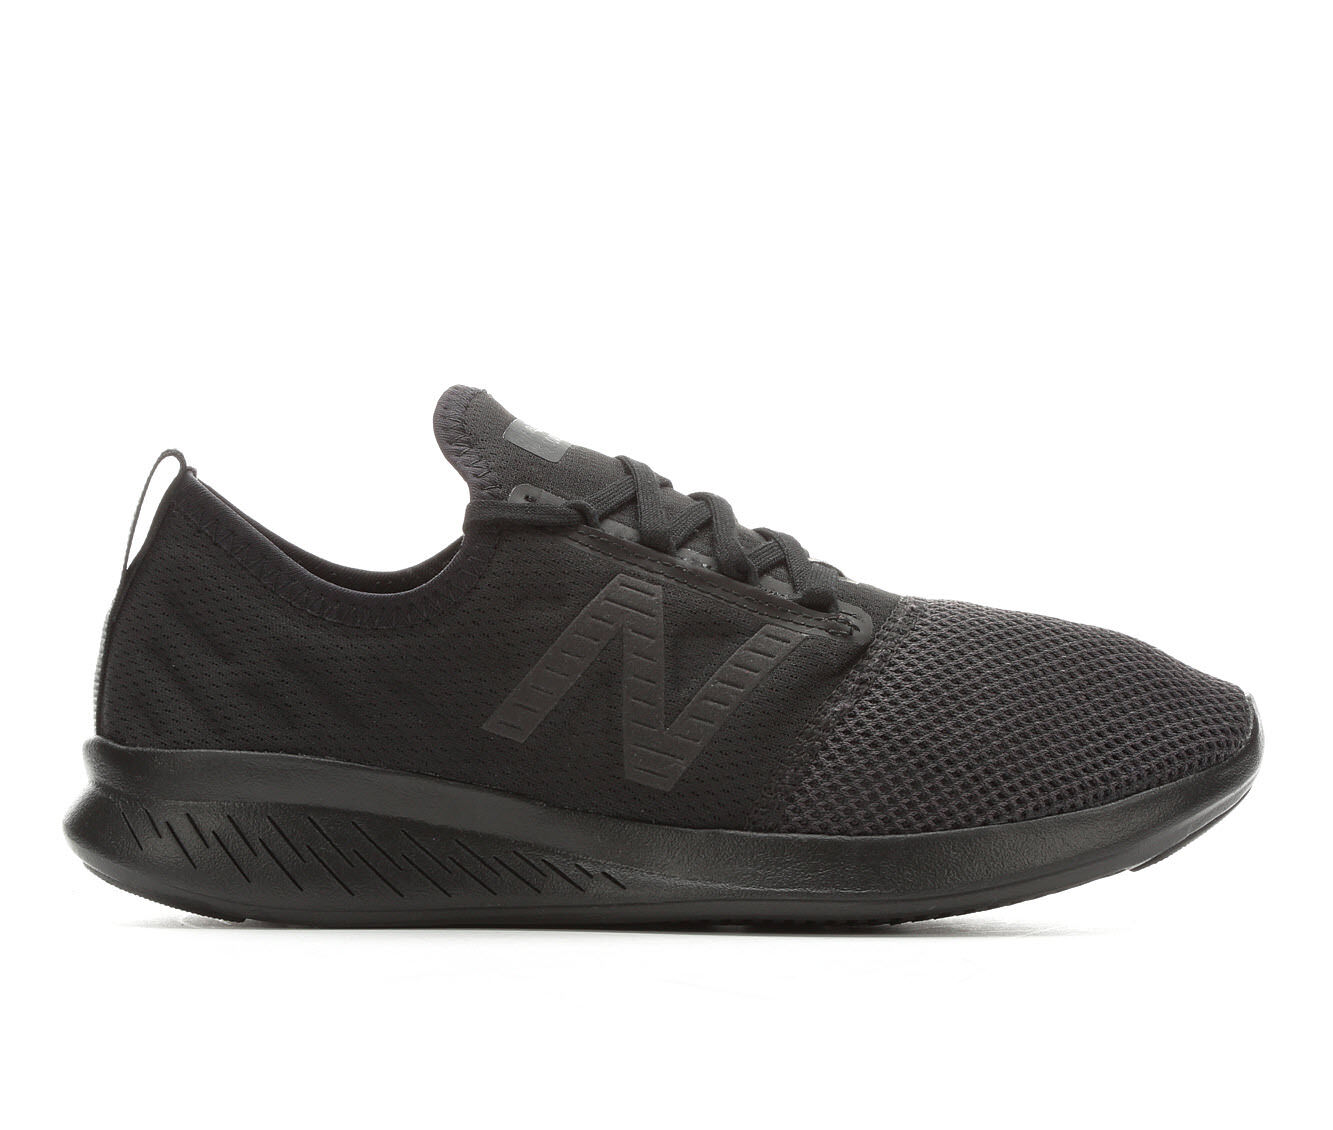 Women's New Balance Coast 4 Sneakers Black/Dk Gry